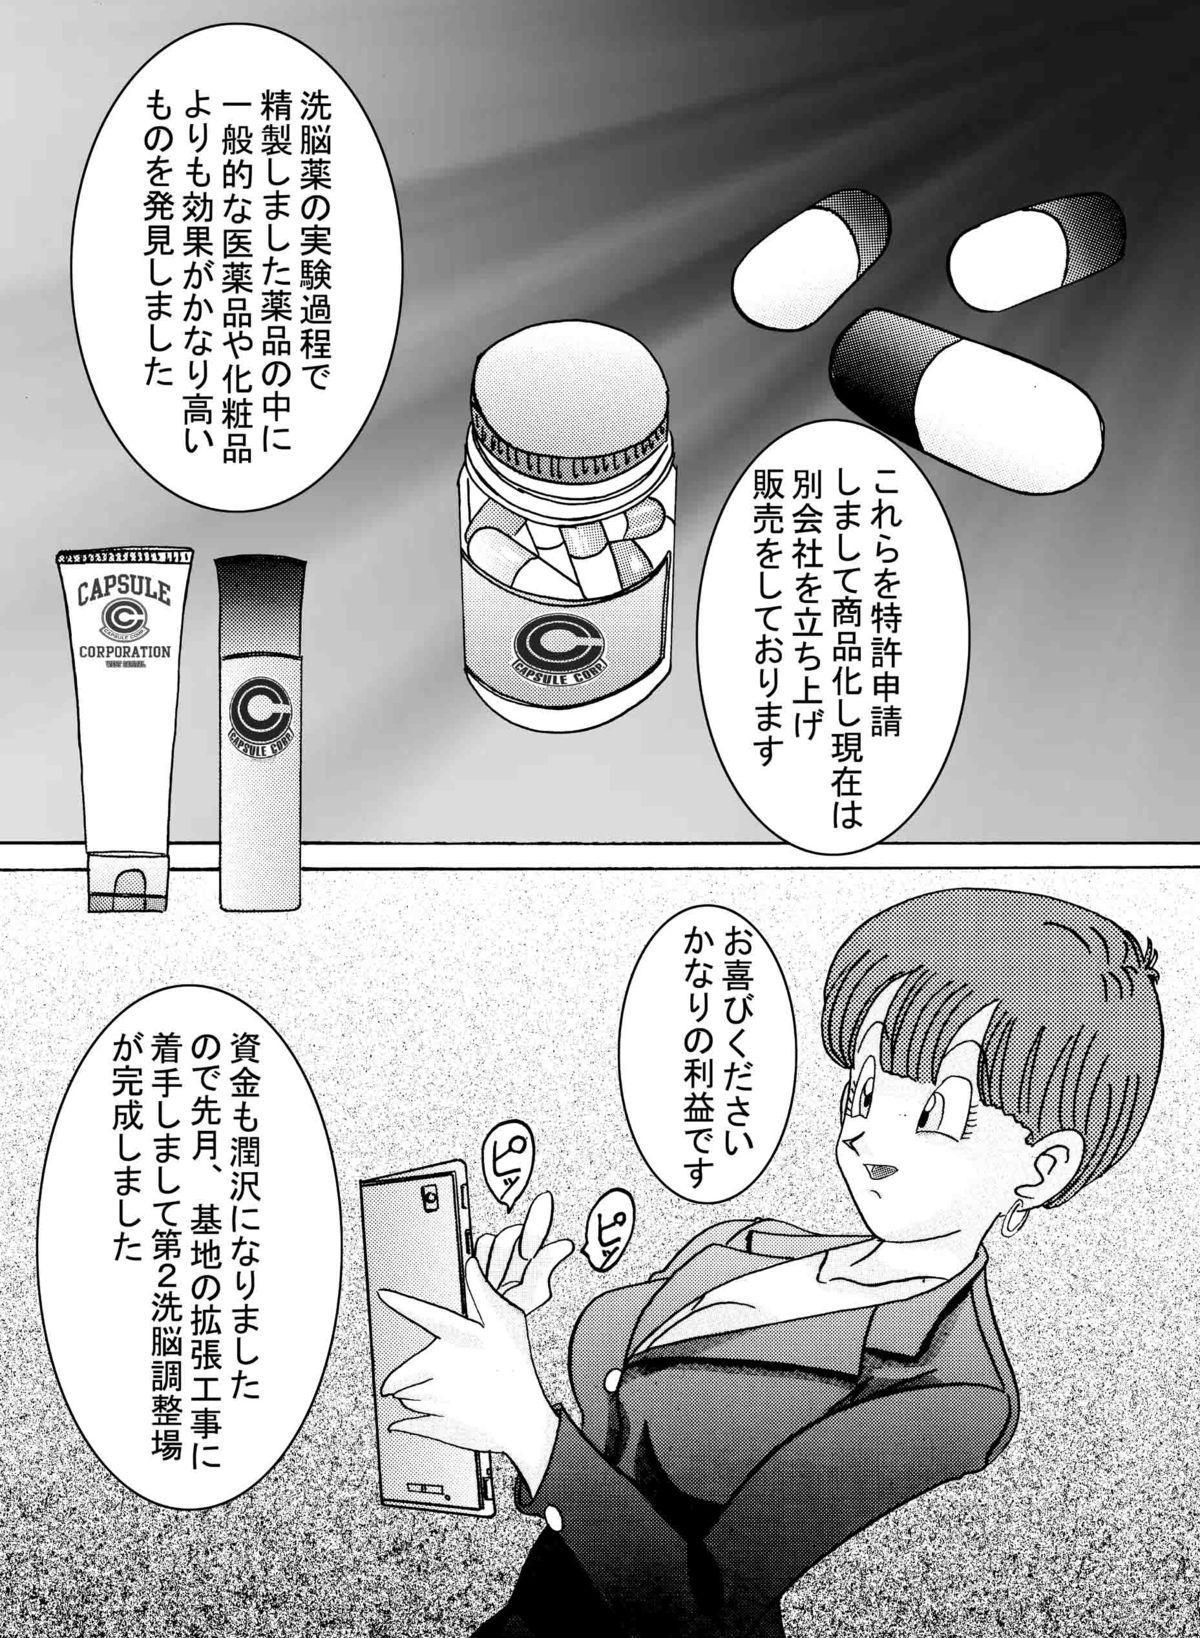 [Light Rate Port Pink] Tanjou!! Aku no Onna Senshi Jinzou Ningen 18-gou Sennou Kaizou Keikaku -Joshou- (Dragon Ball Z) 4